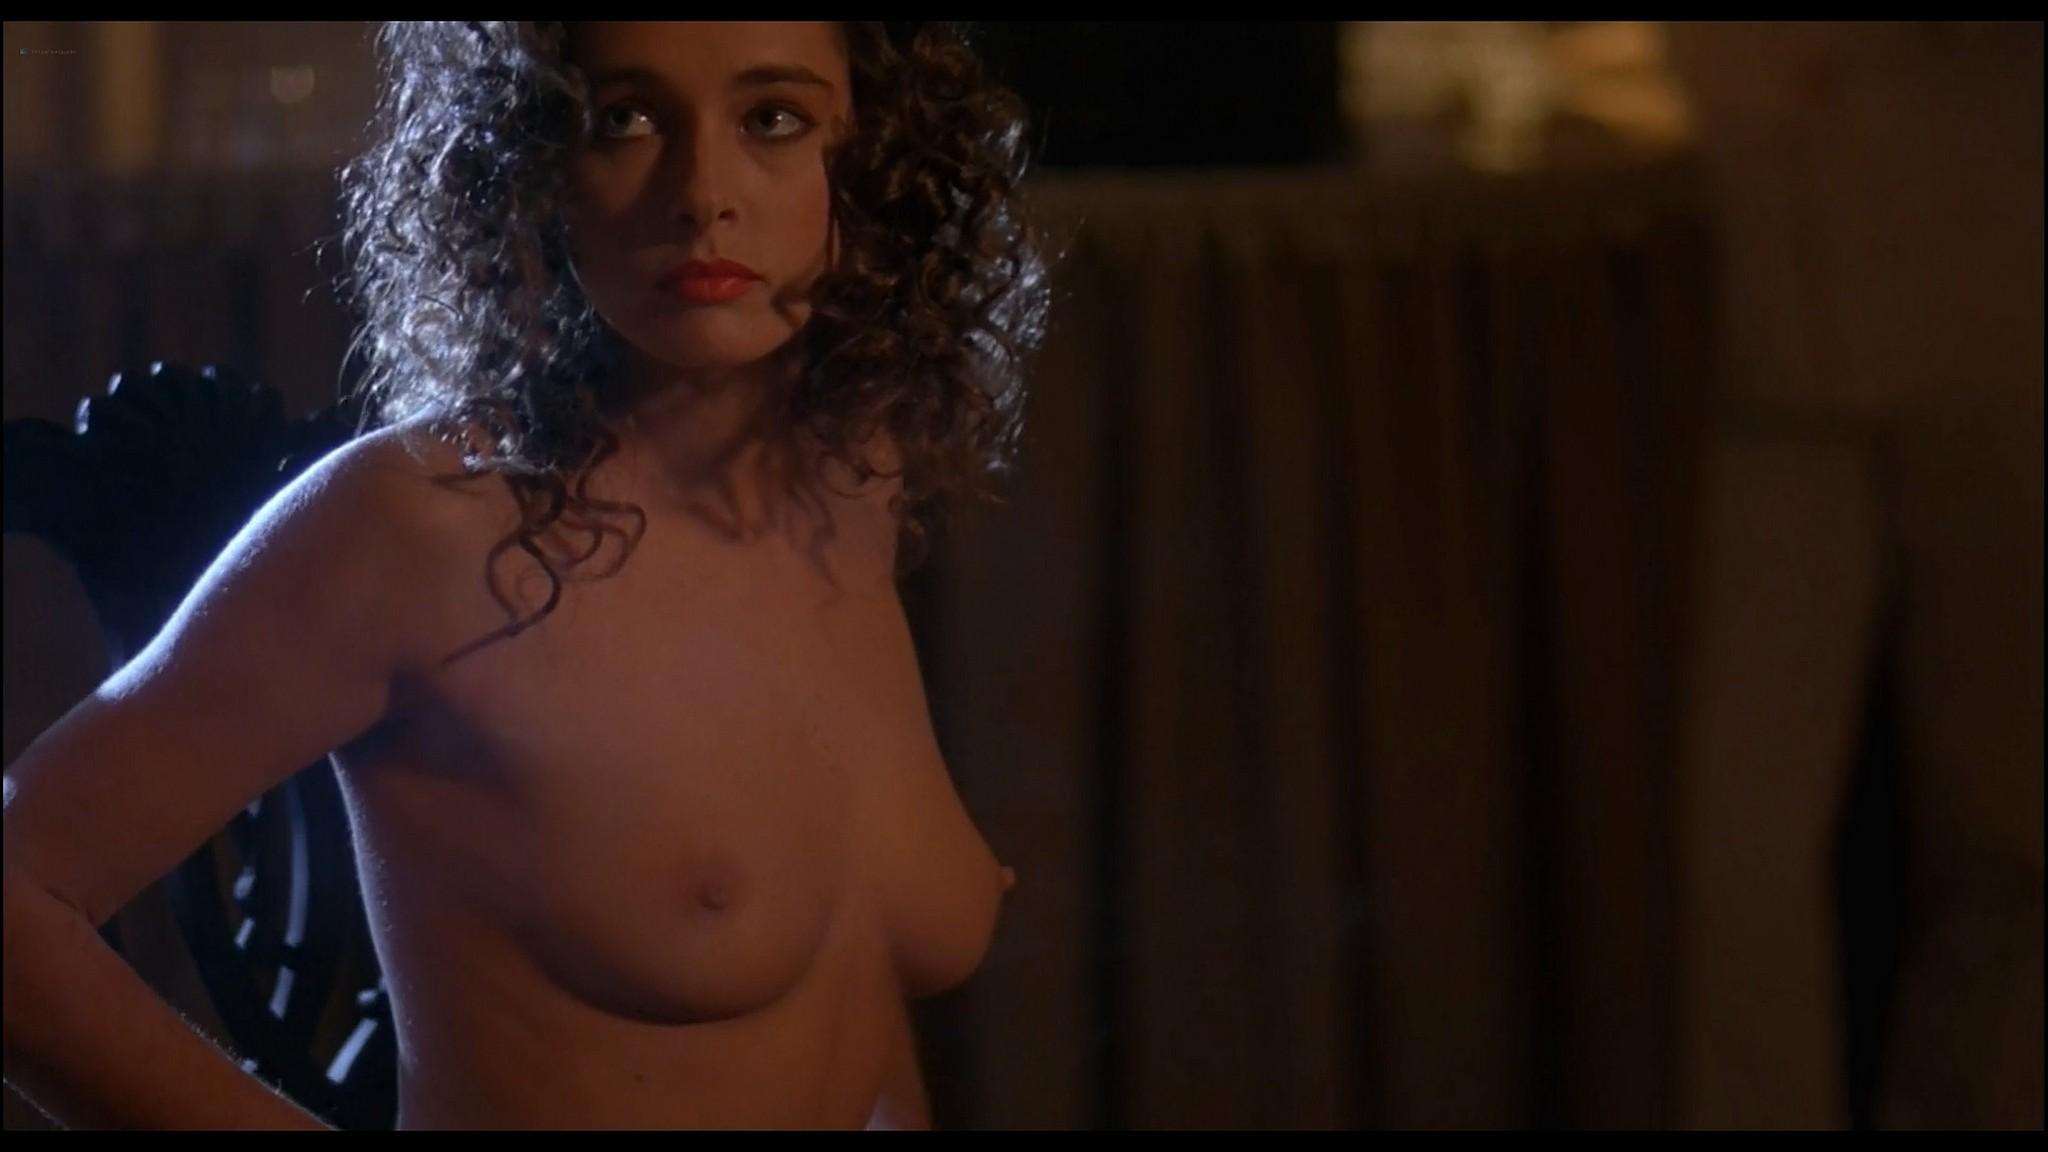 Nina Siemaszko nude sex Lydie Denier Gloria Reuben and others nude sex Wild Orchid 2 1992 1080p BluRay 3